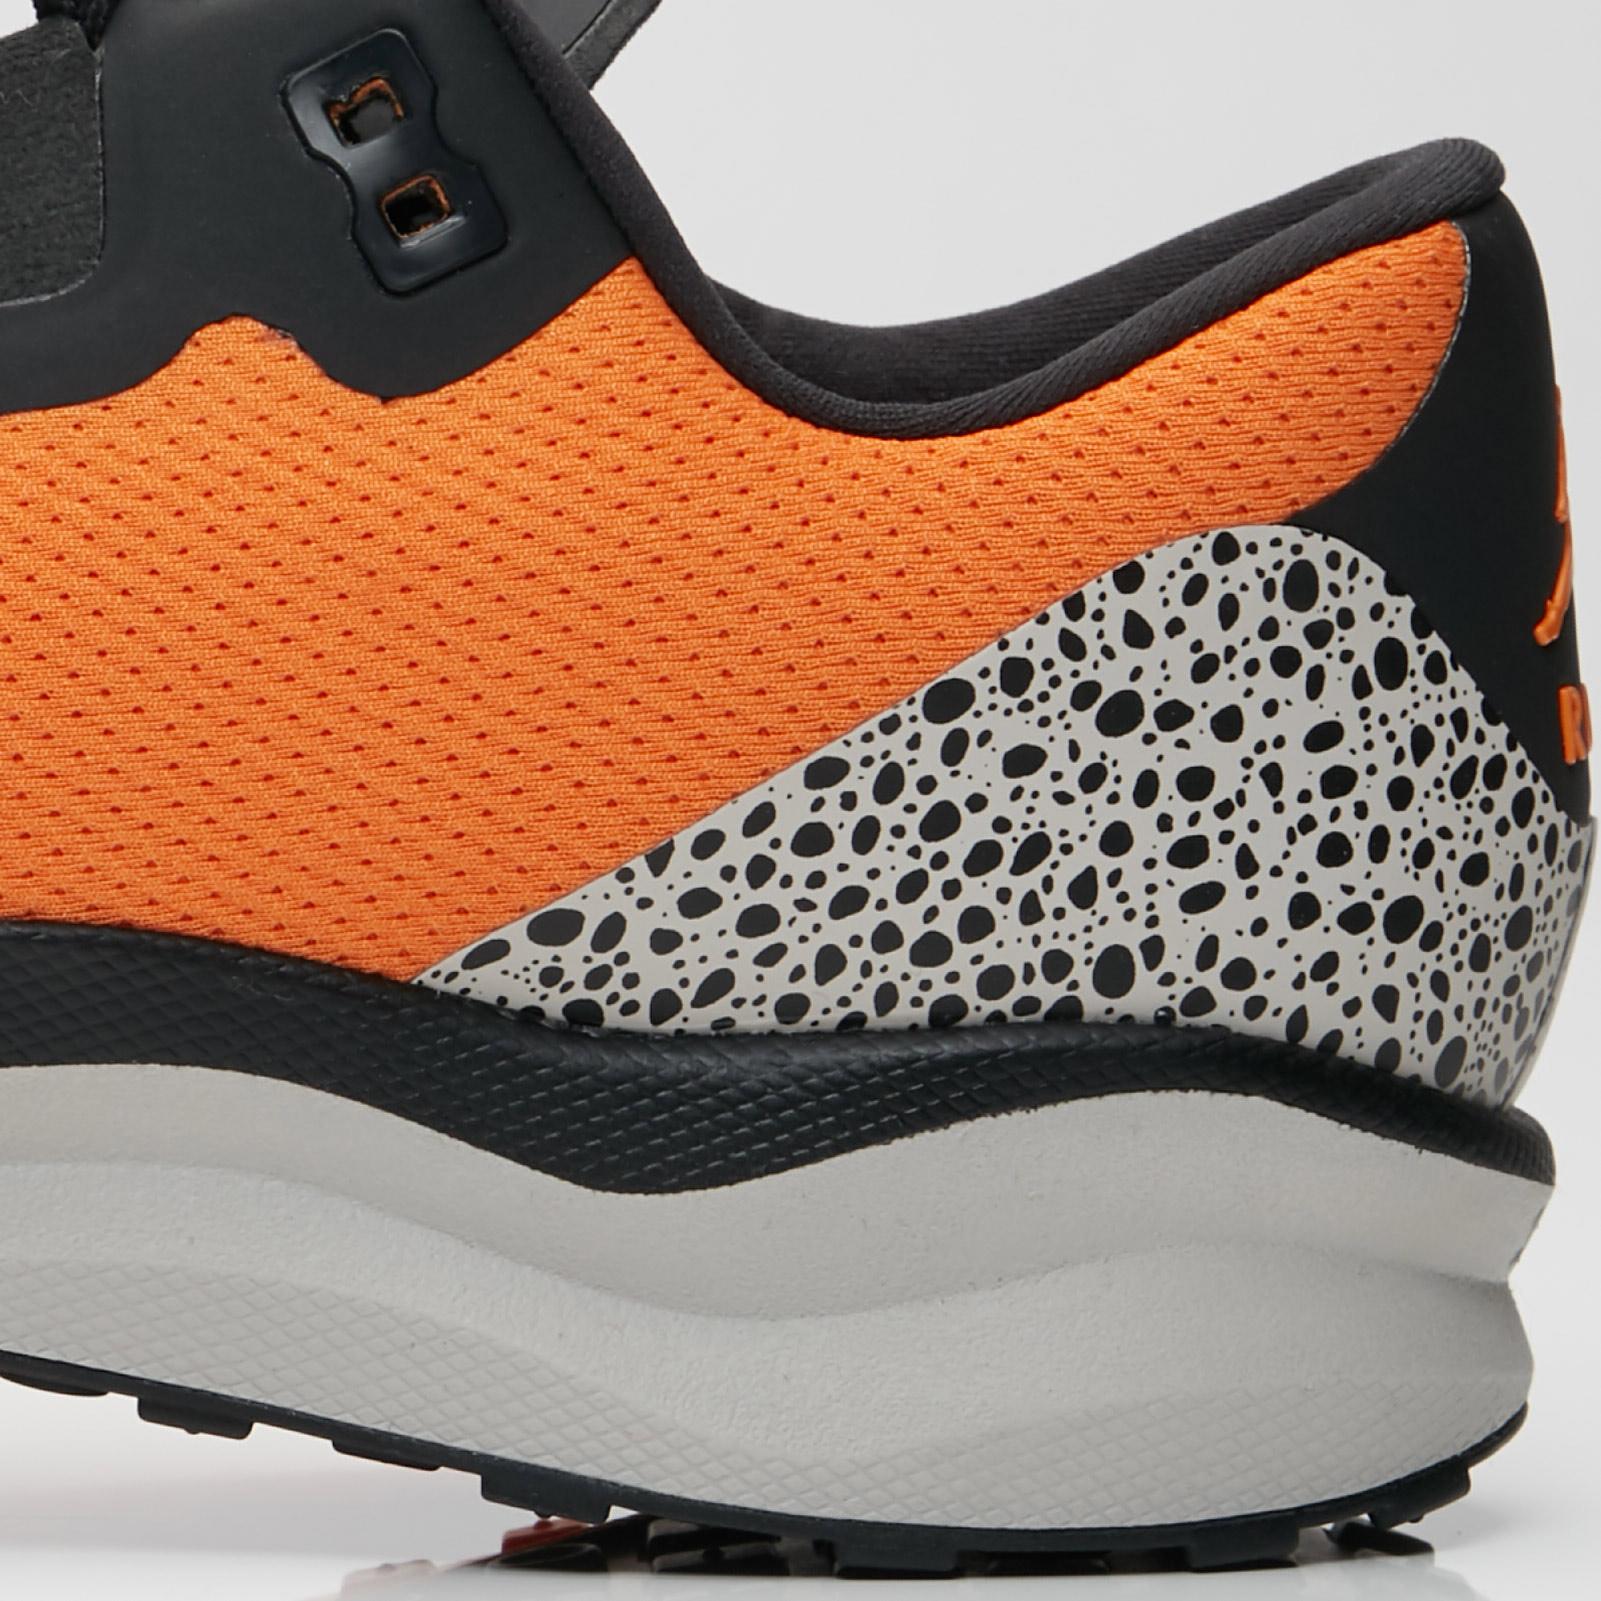 Jordan Brand Zoom Tenacity 88 - Av5878-800 - Sneakersnstuff ... 46e54b272fc3